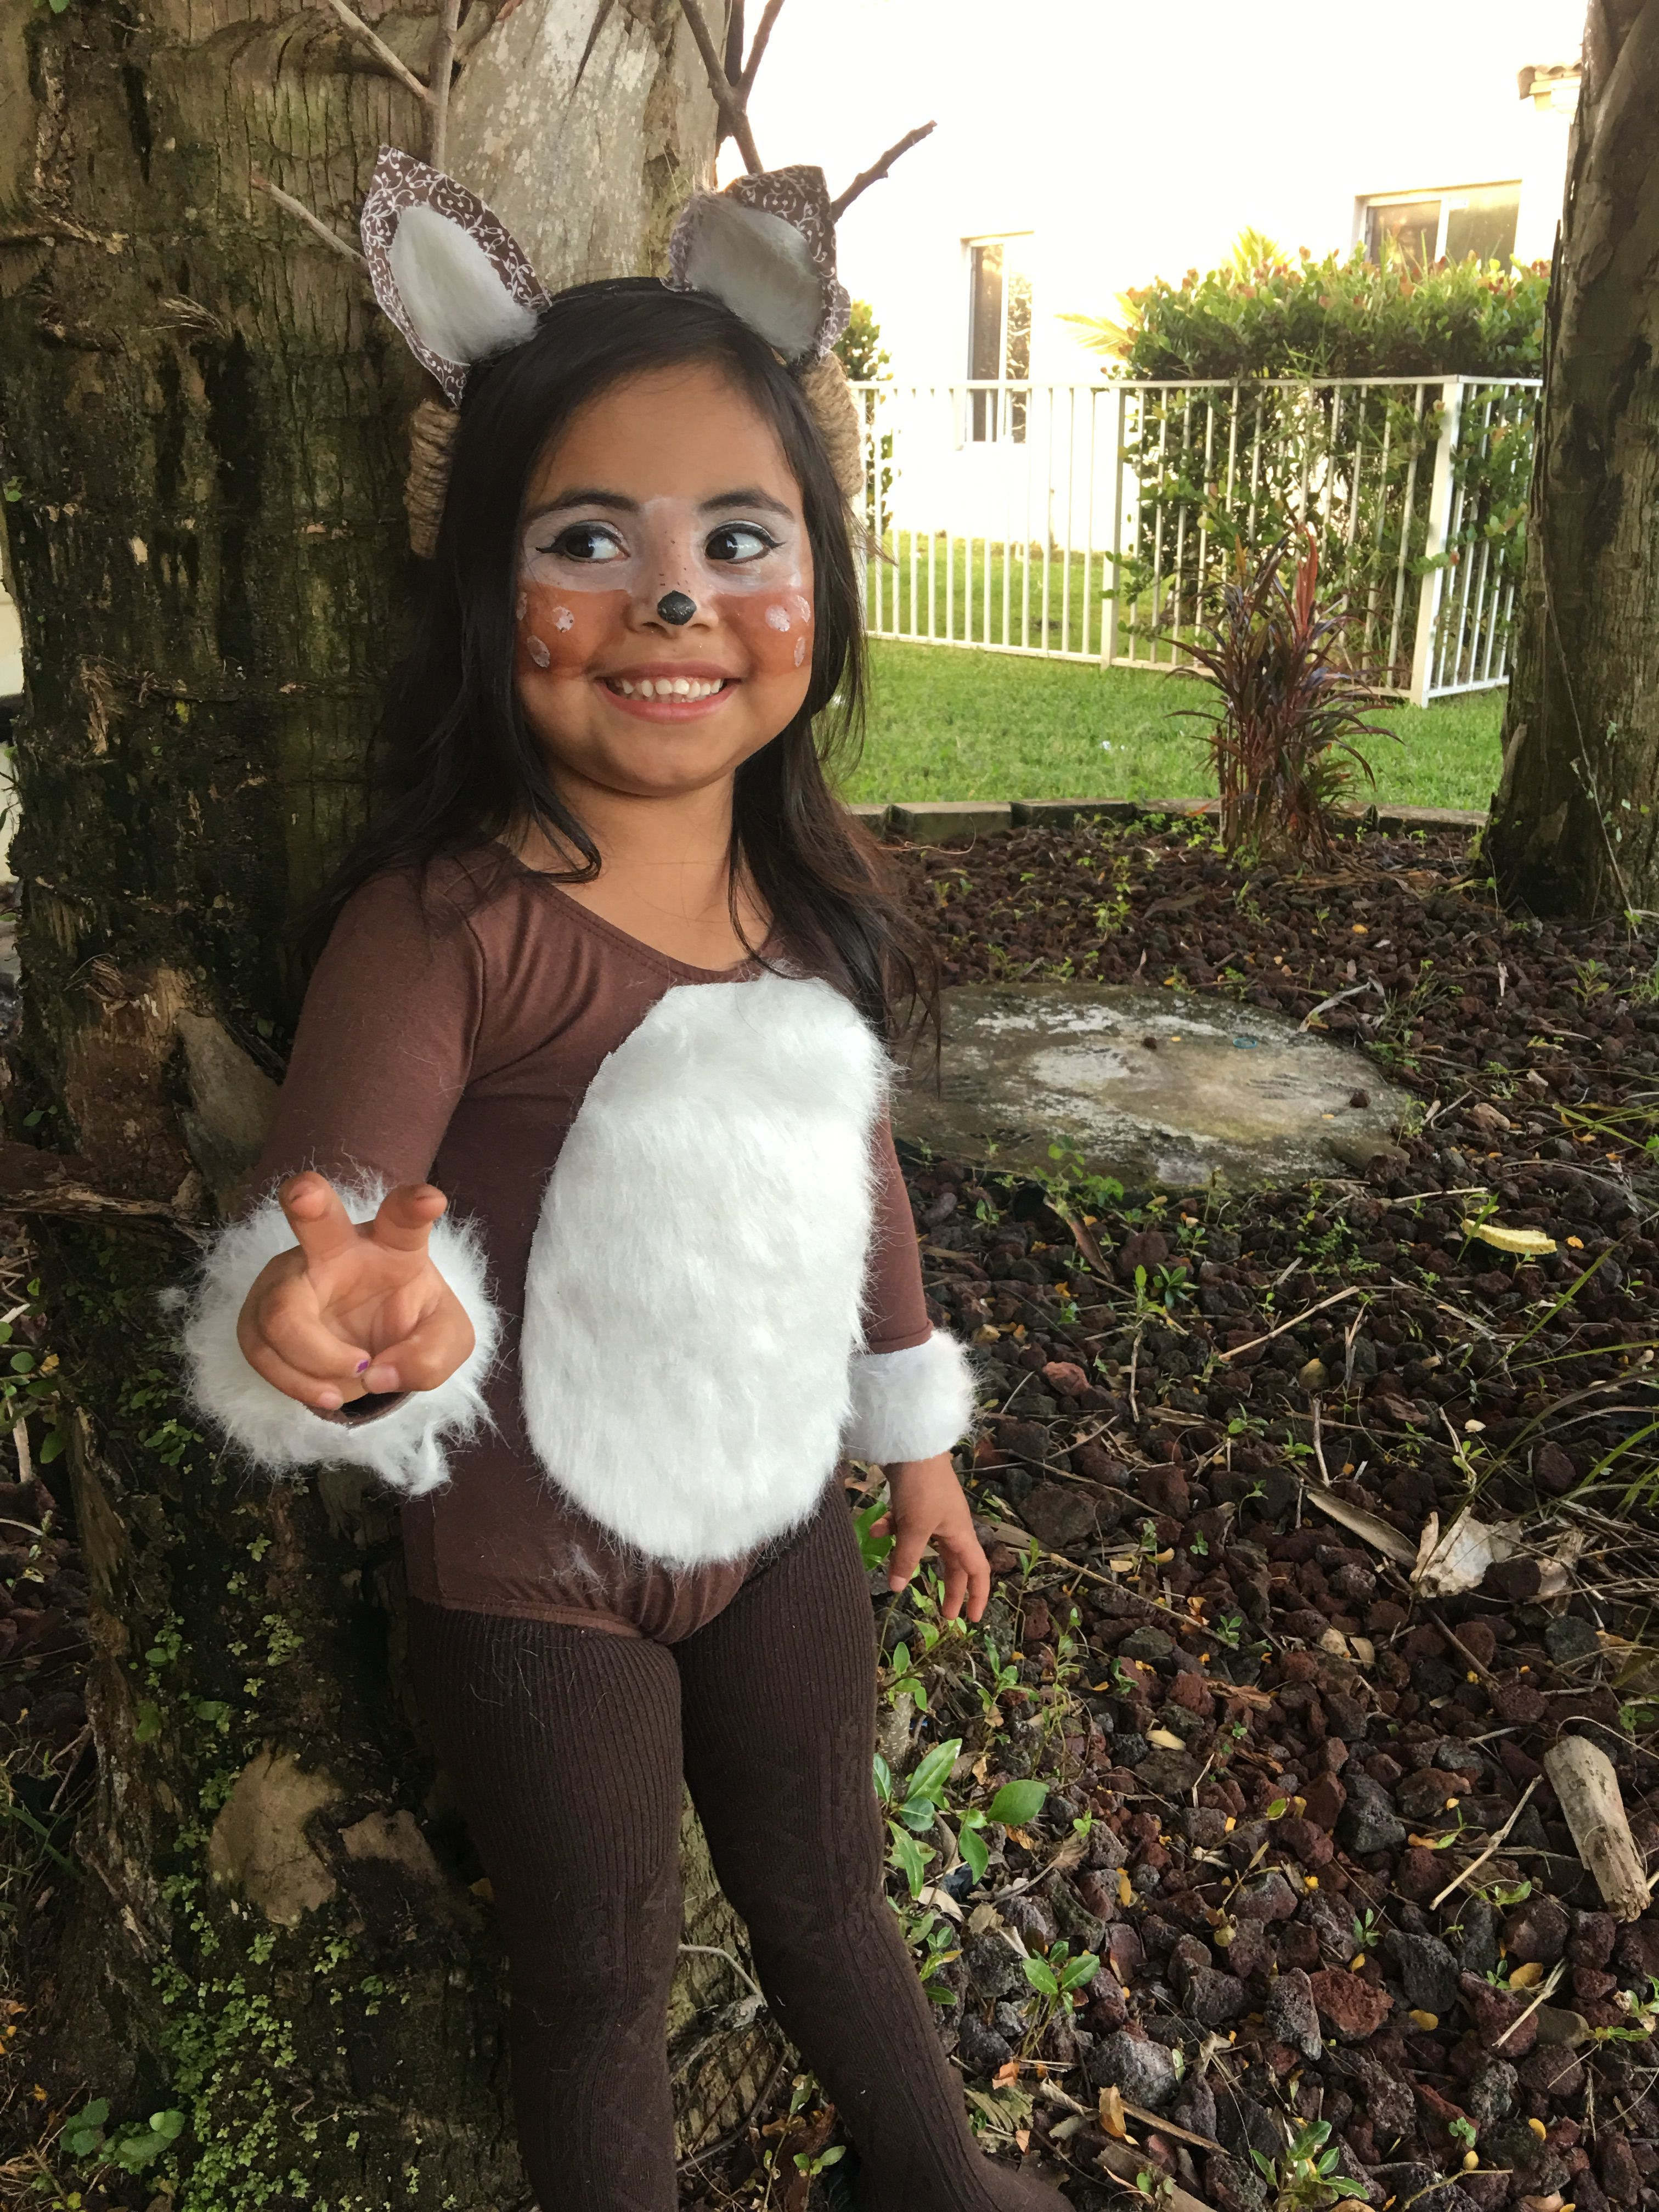 Reindeer Doe Costume Halloween Diy Diy Costumes Kids Reindeer Costume Halloween Costumes For Girls